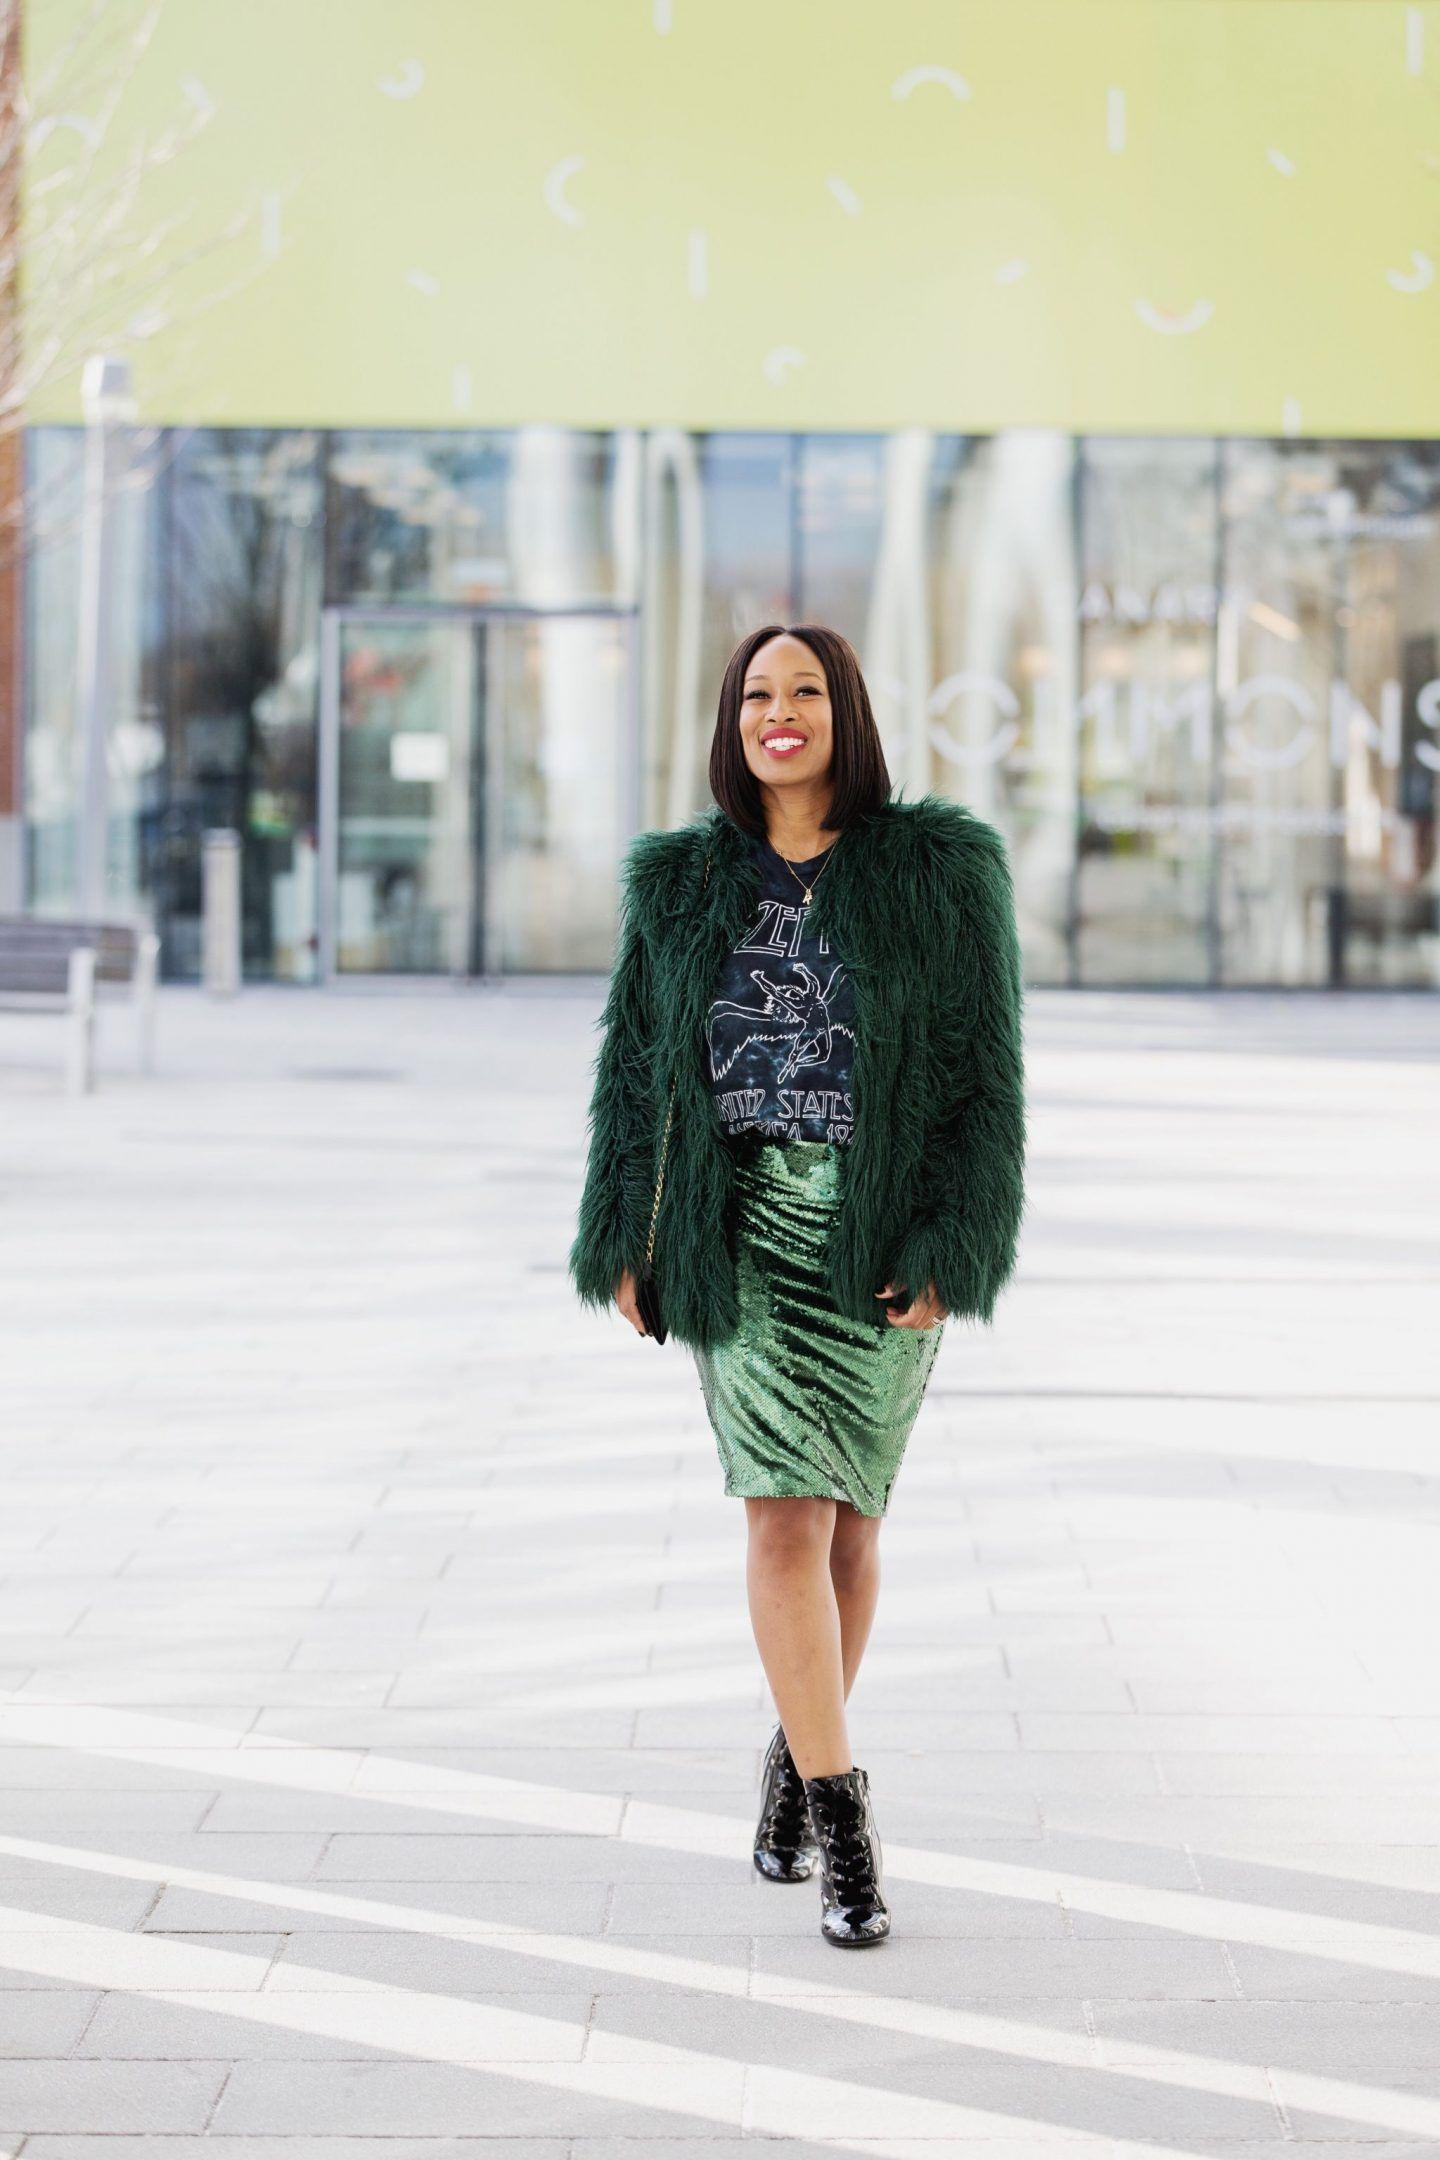 Buy How to sequin wear skirt in winter pictures trends